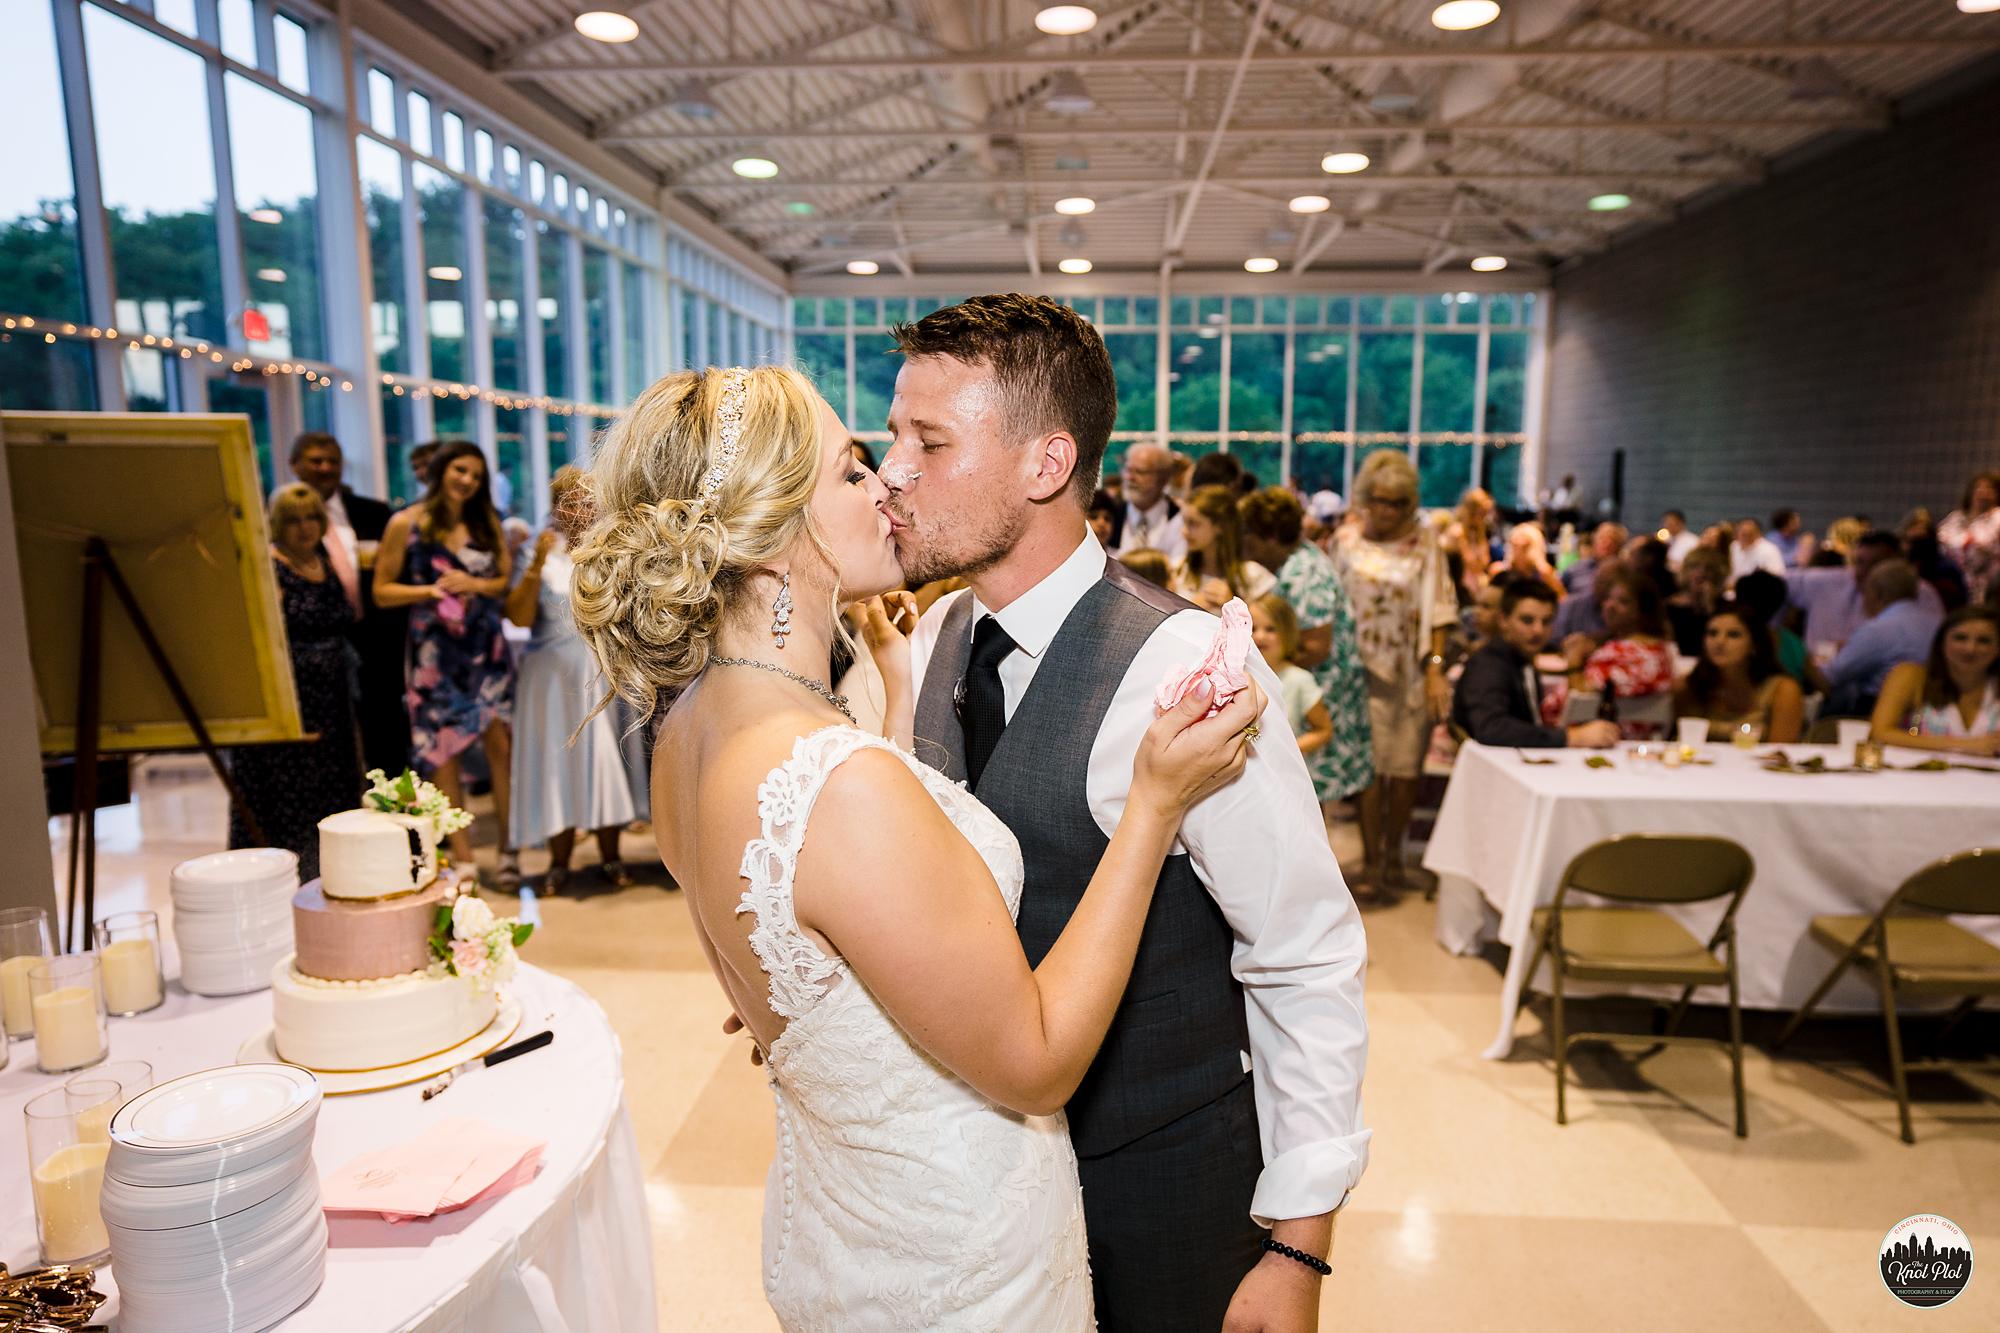 Southgate-Community-Center-KY-Wedding-Photography-26.jpg